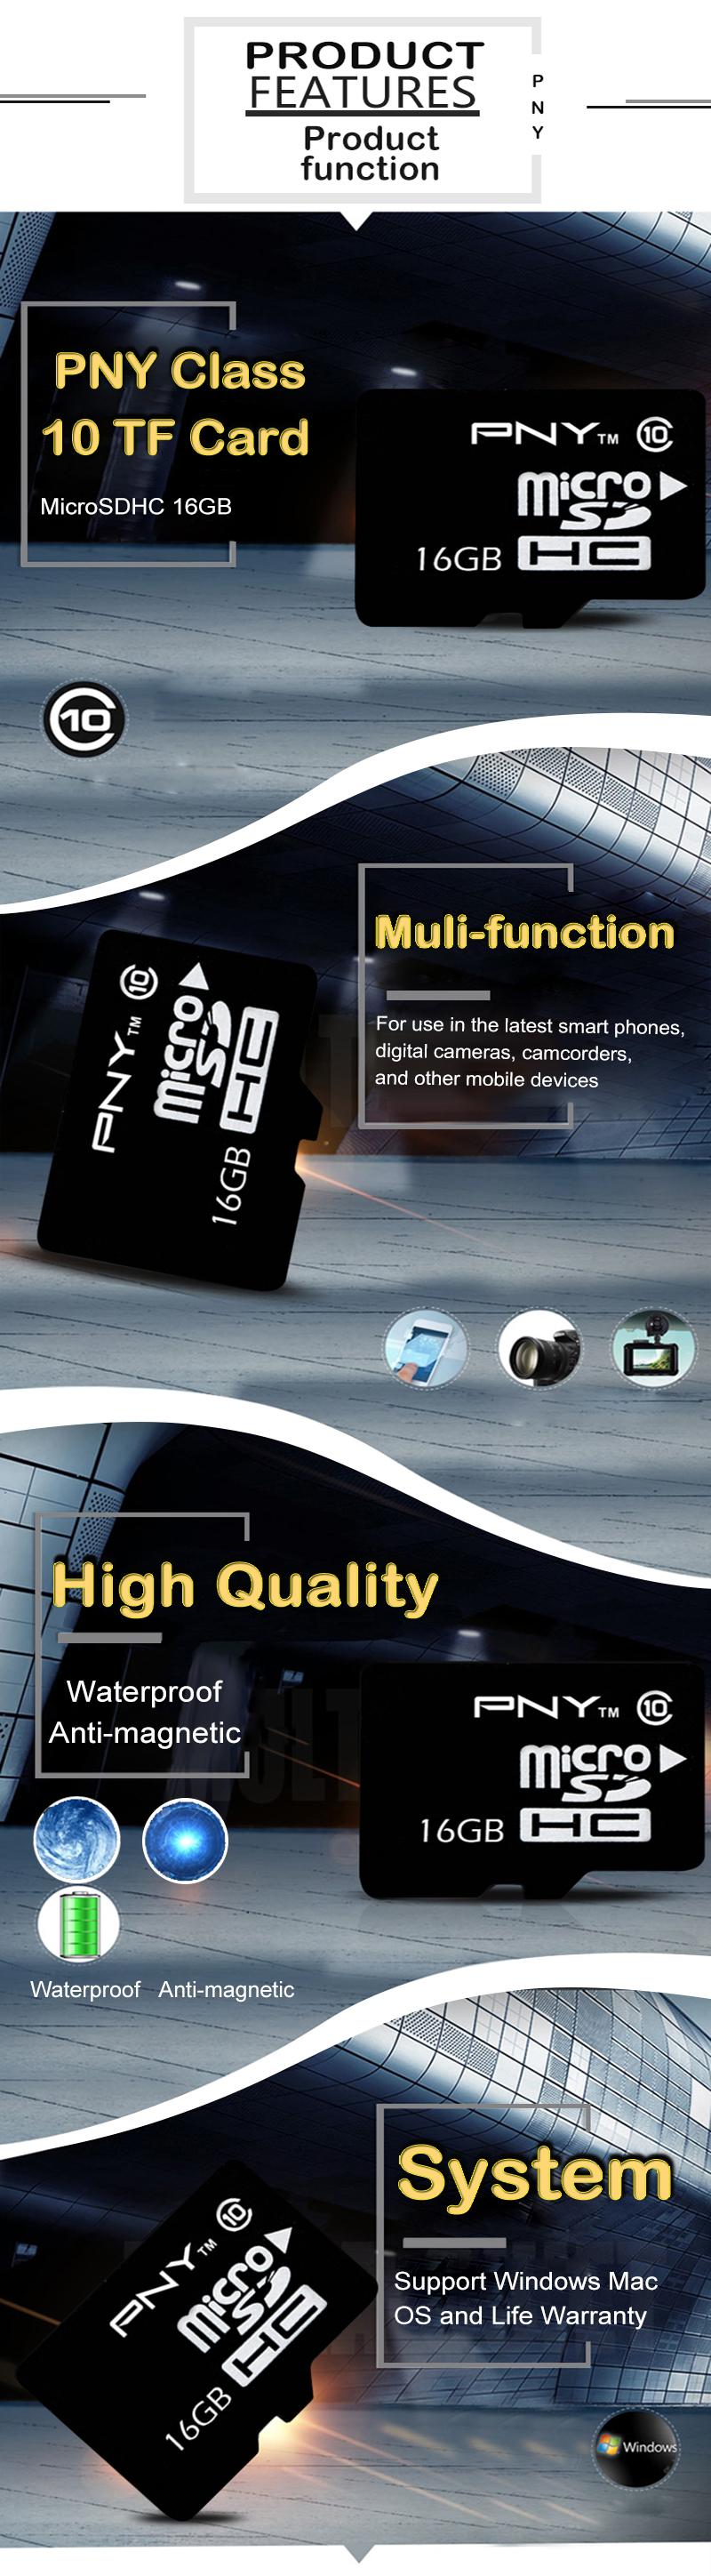 PNY-C10 16GB3